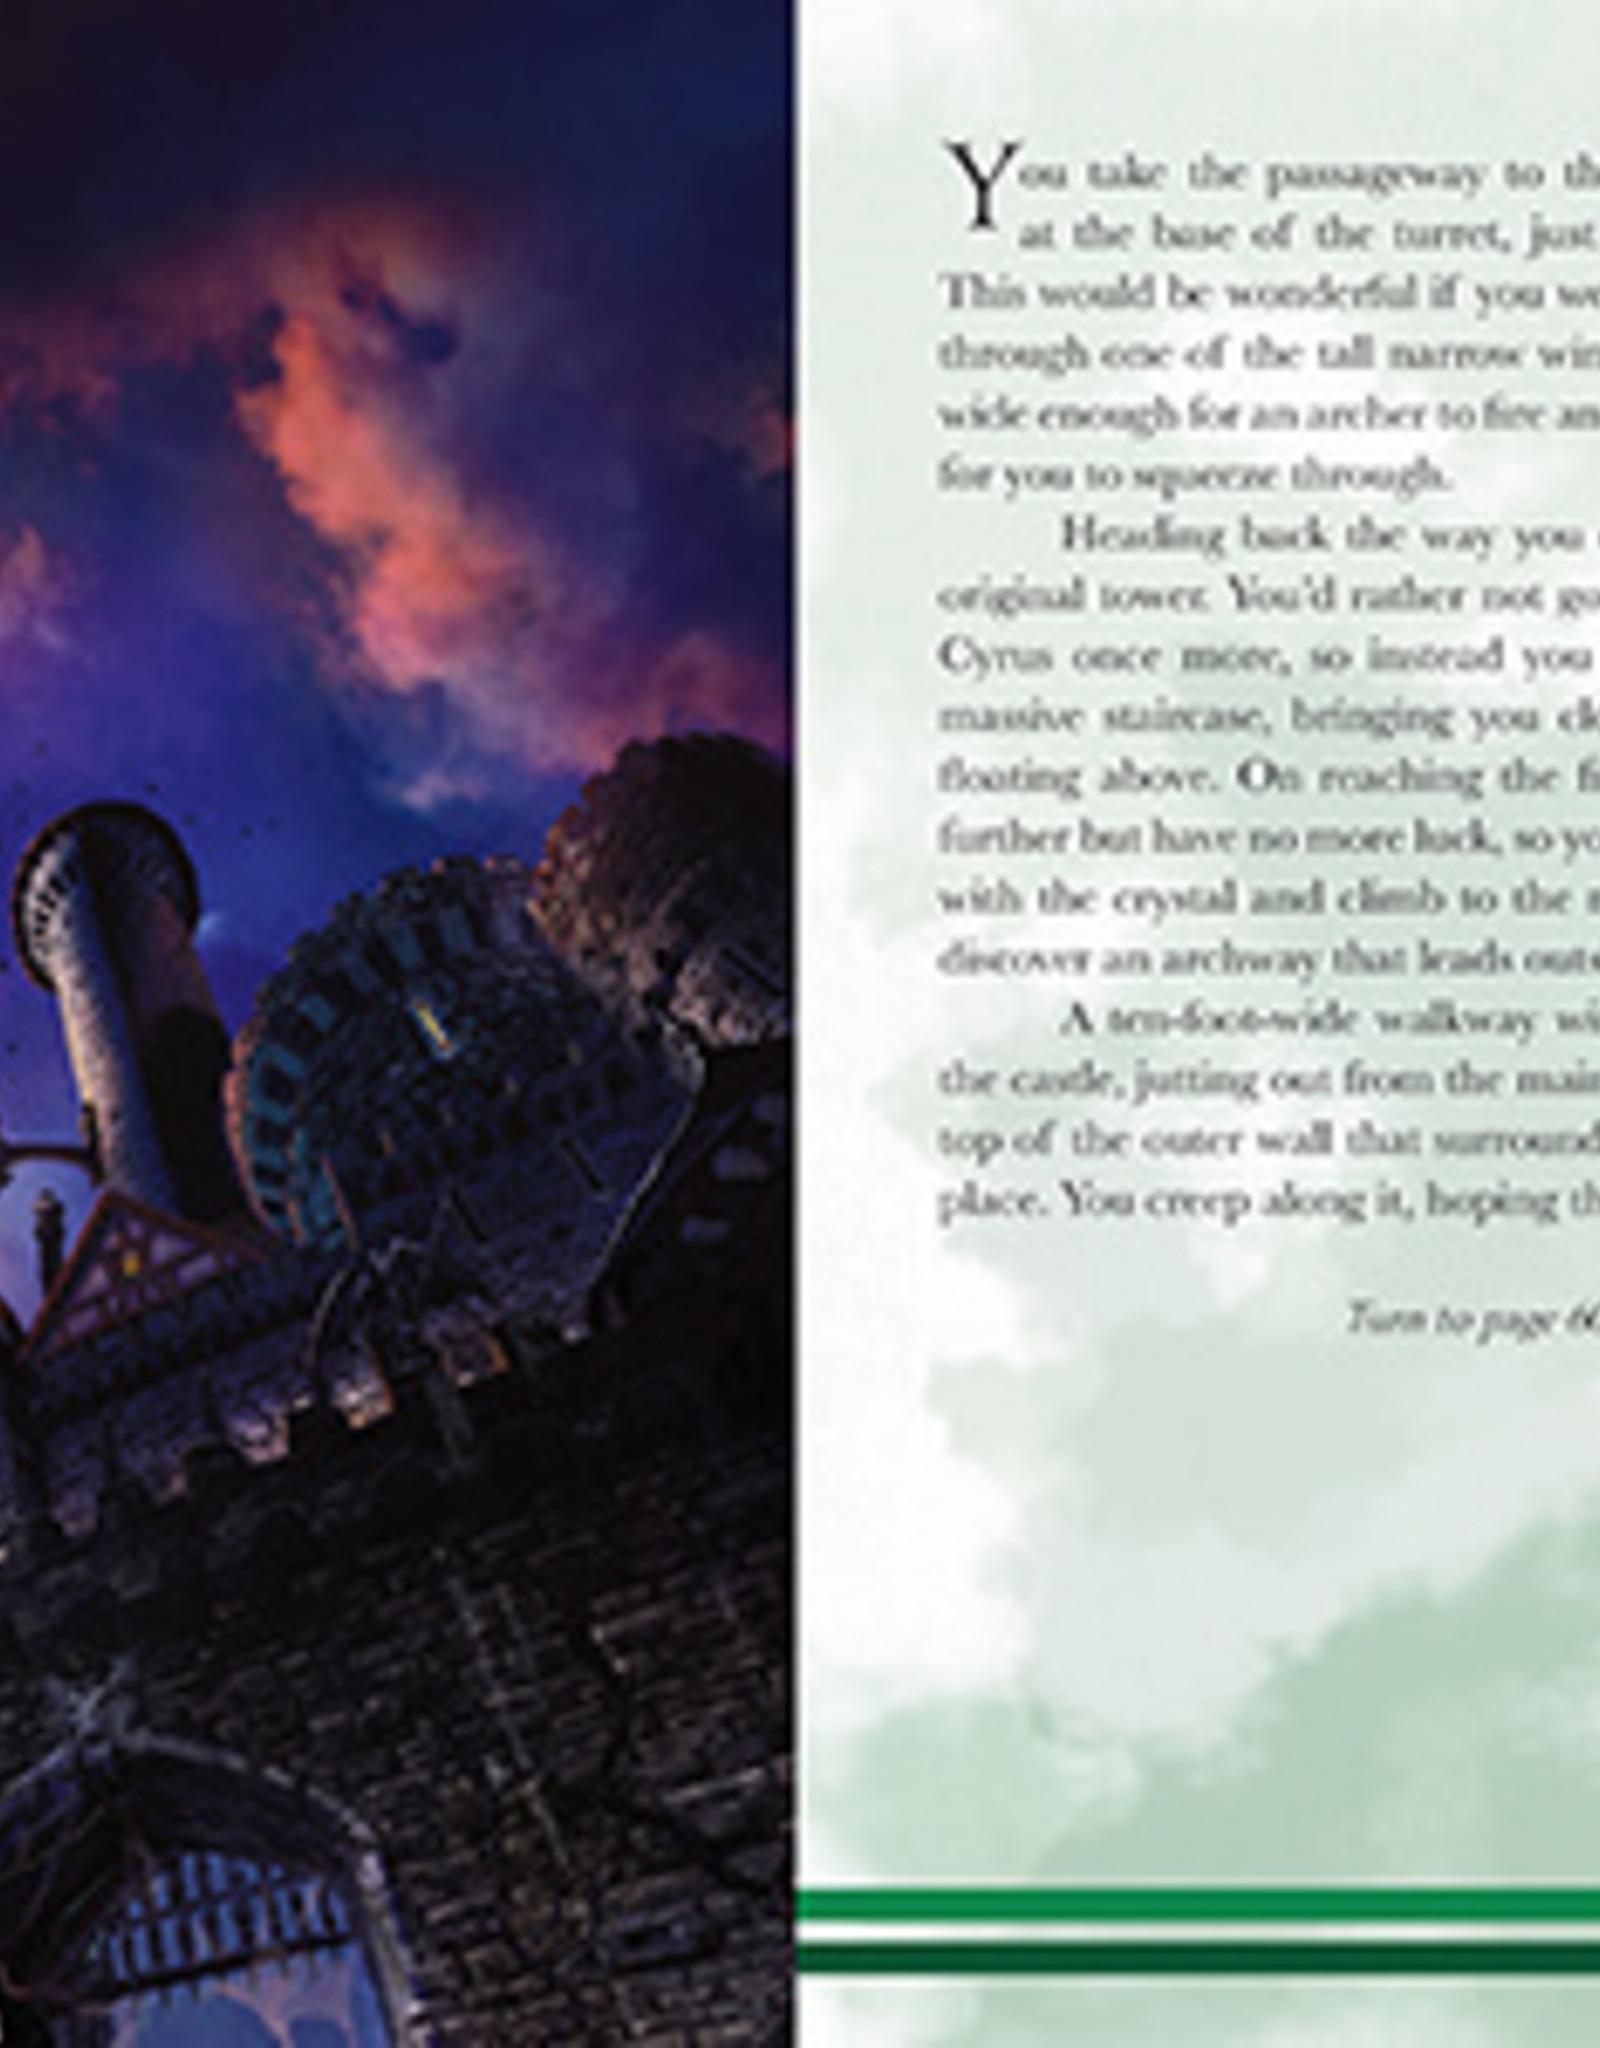 Dungeons & Dragons - Escape from Castle Ravenloft - An Endless Quest Book